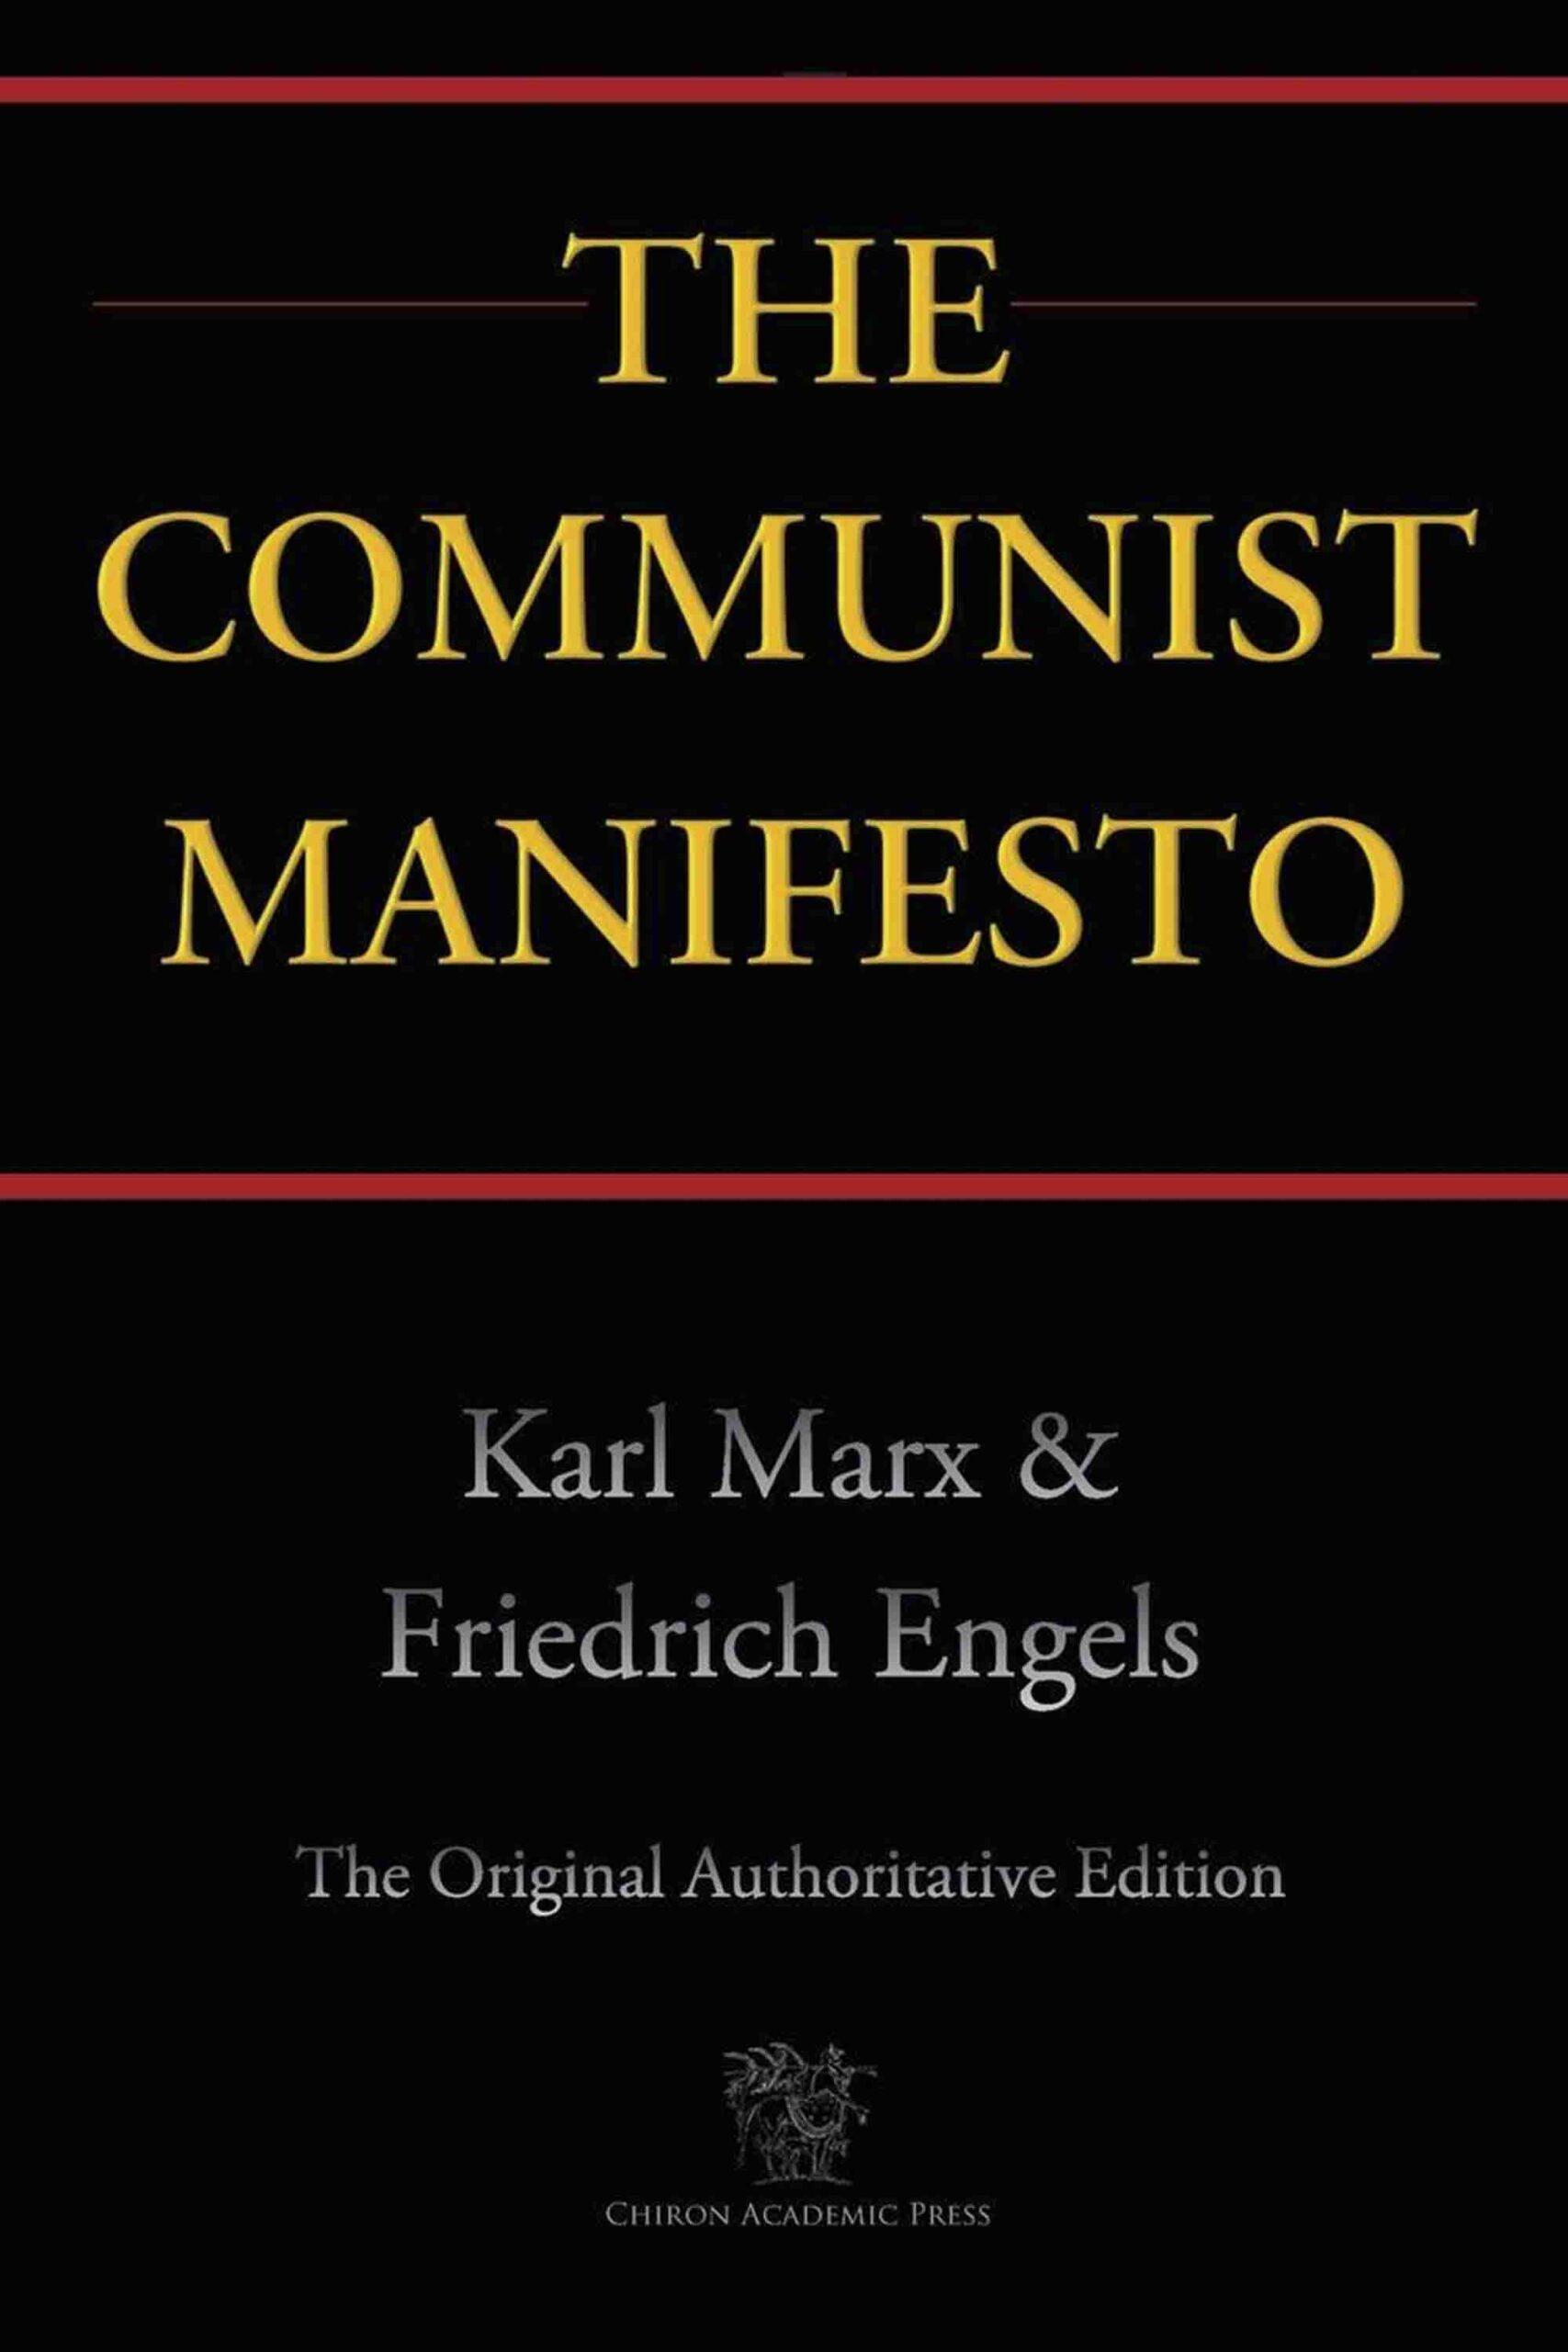 The Communist Manifesto (Chiron Academic Press – The Original Authoritative Edition)